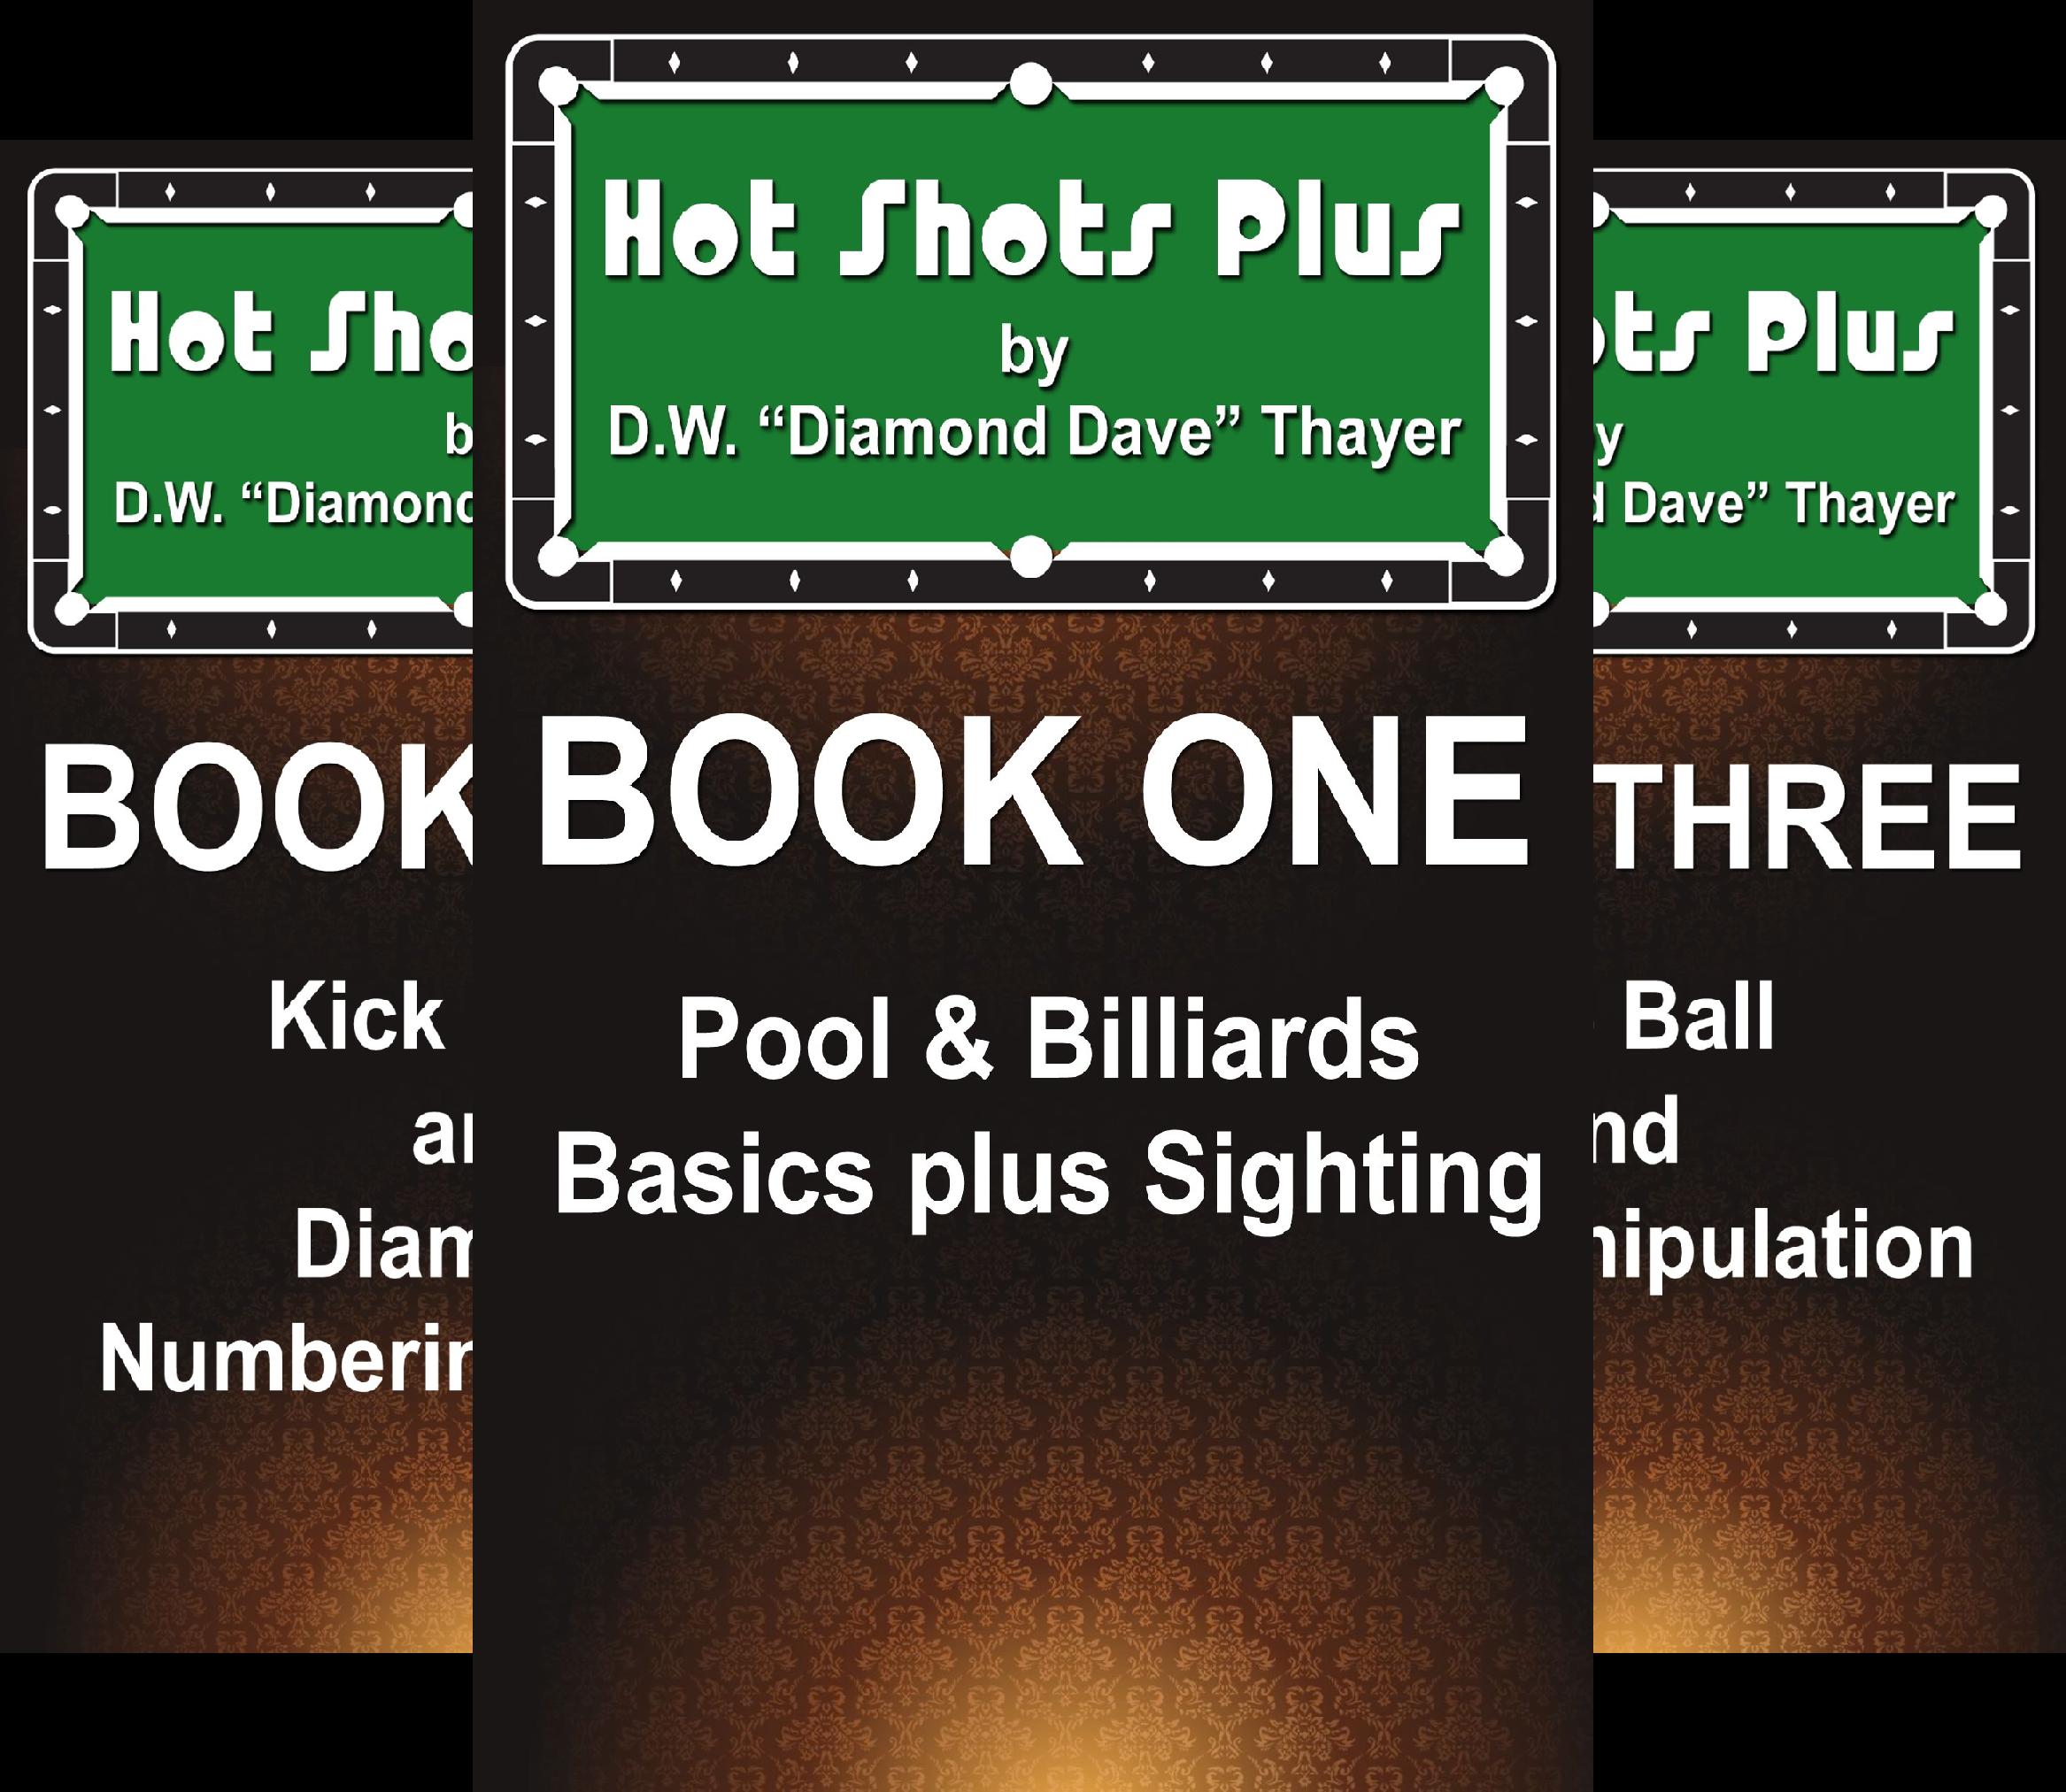 Hot Shots Plus - 6 Book Pool and Billiards Series (6 Book Series)